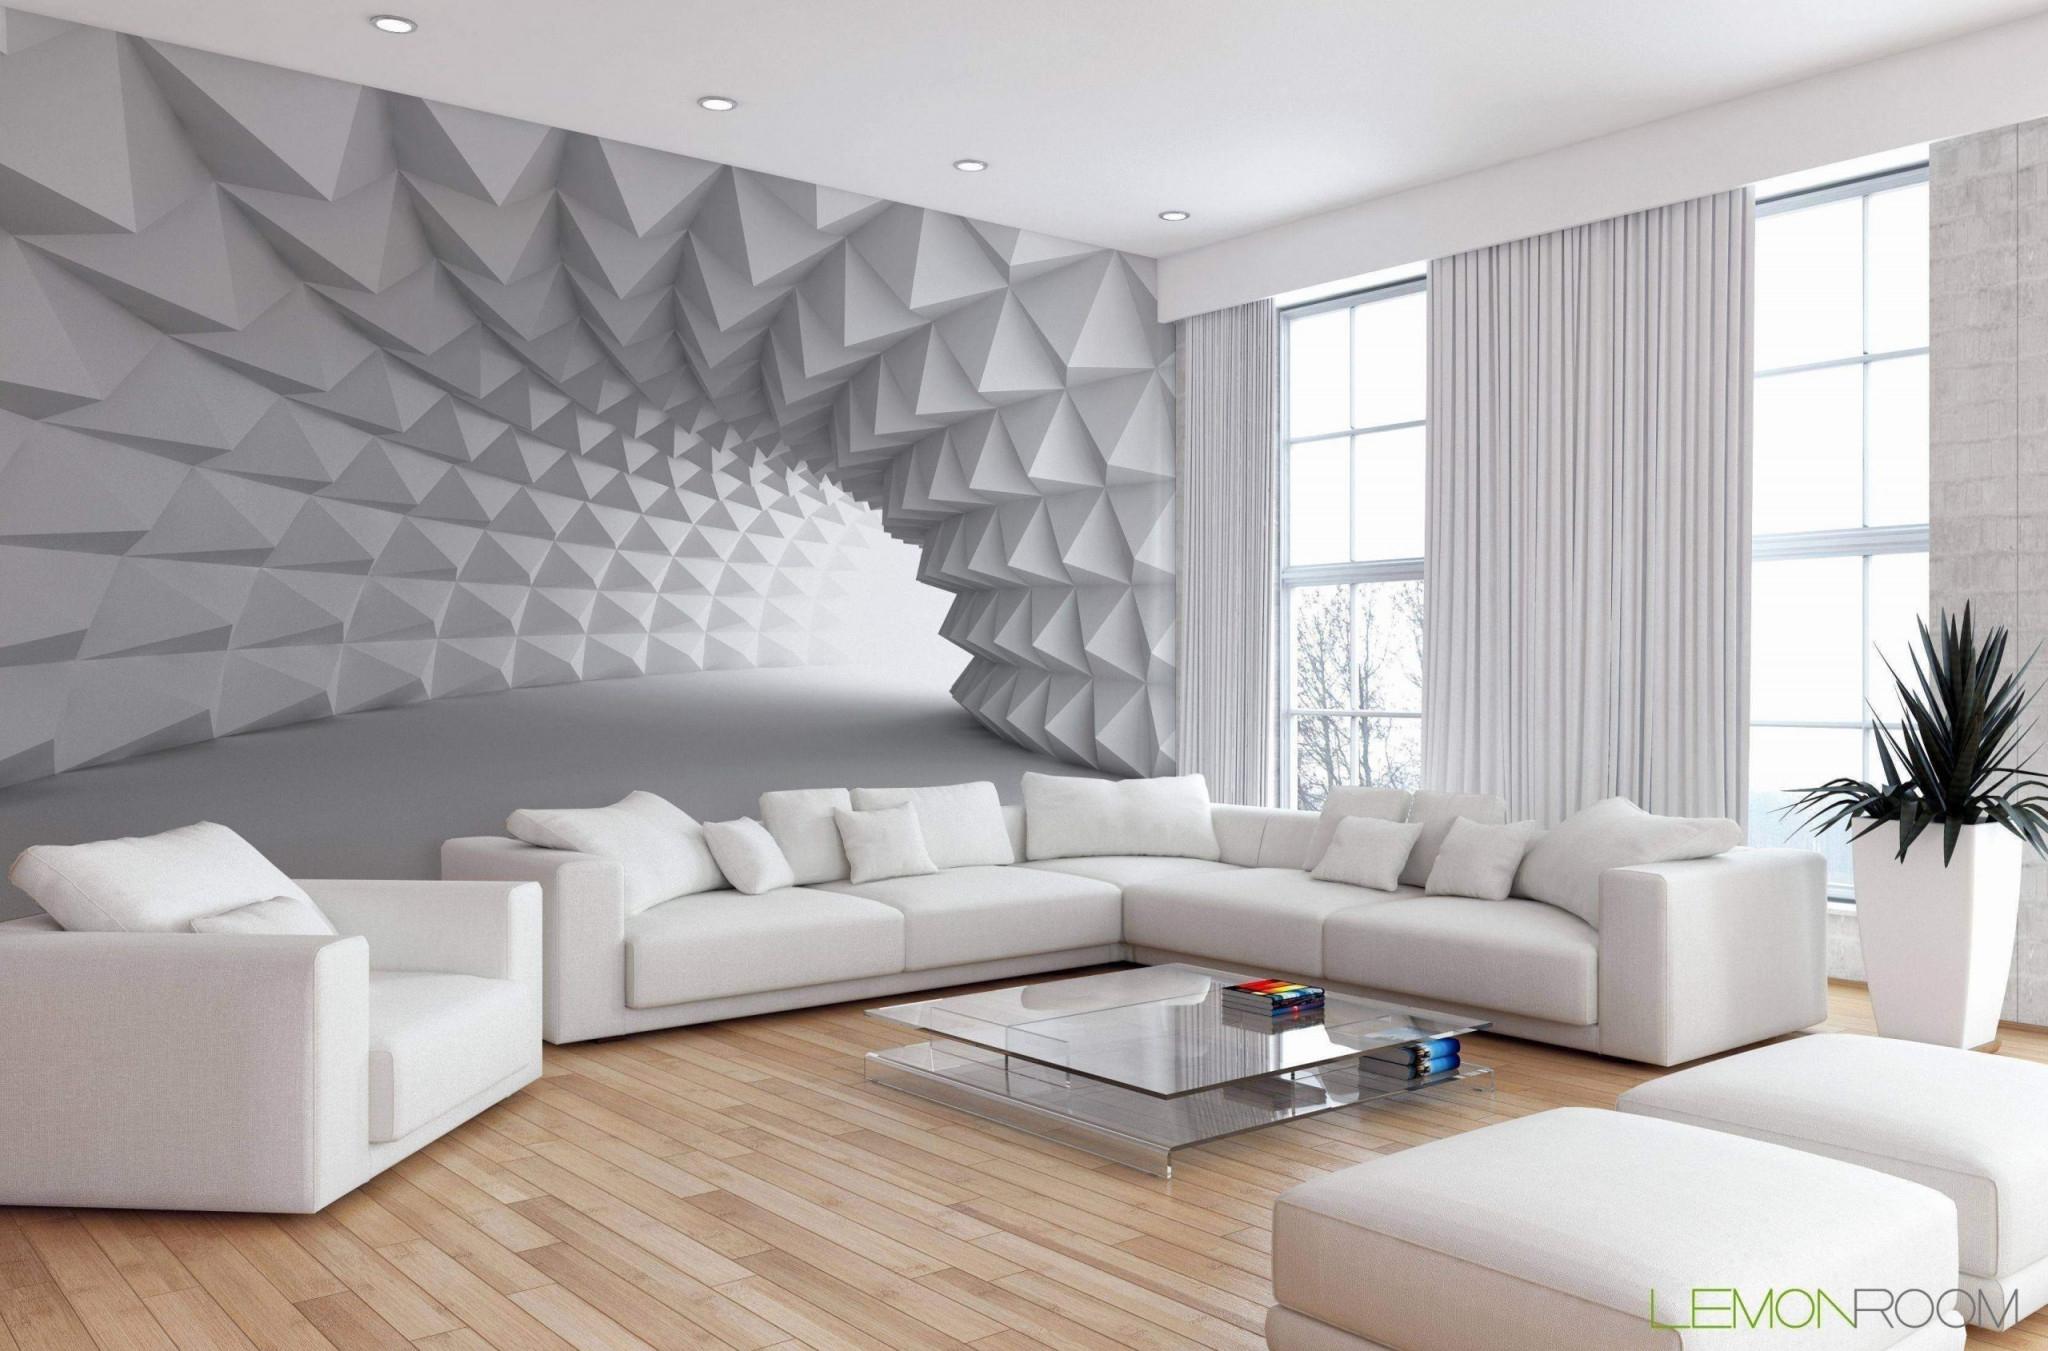 Tapeten Ideen Wohnzimmer In 2020  Design Living Room von Wohnzimmer Tapeten Ideen Photo